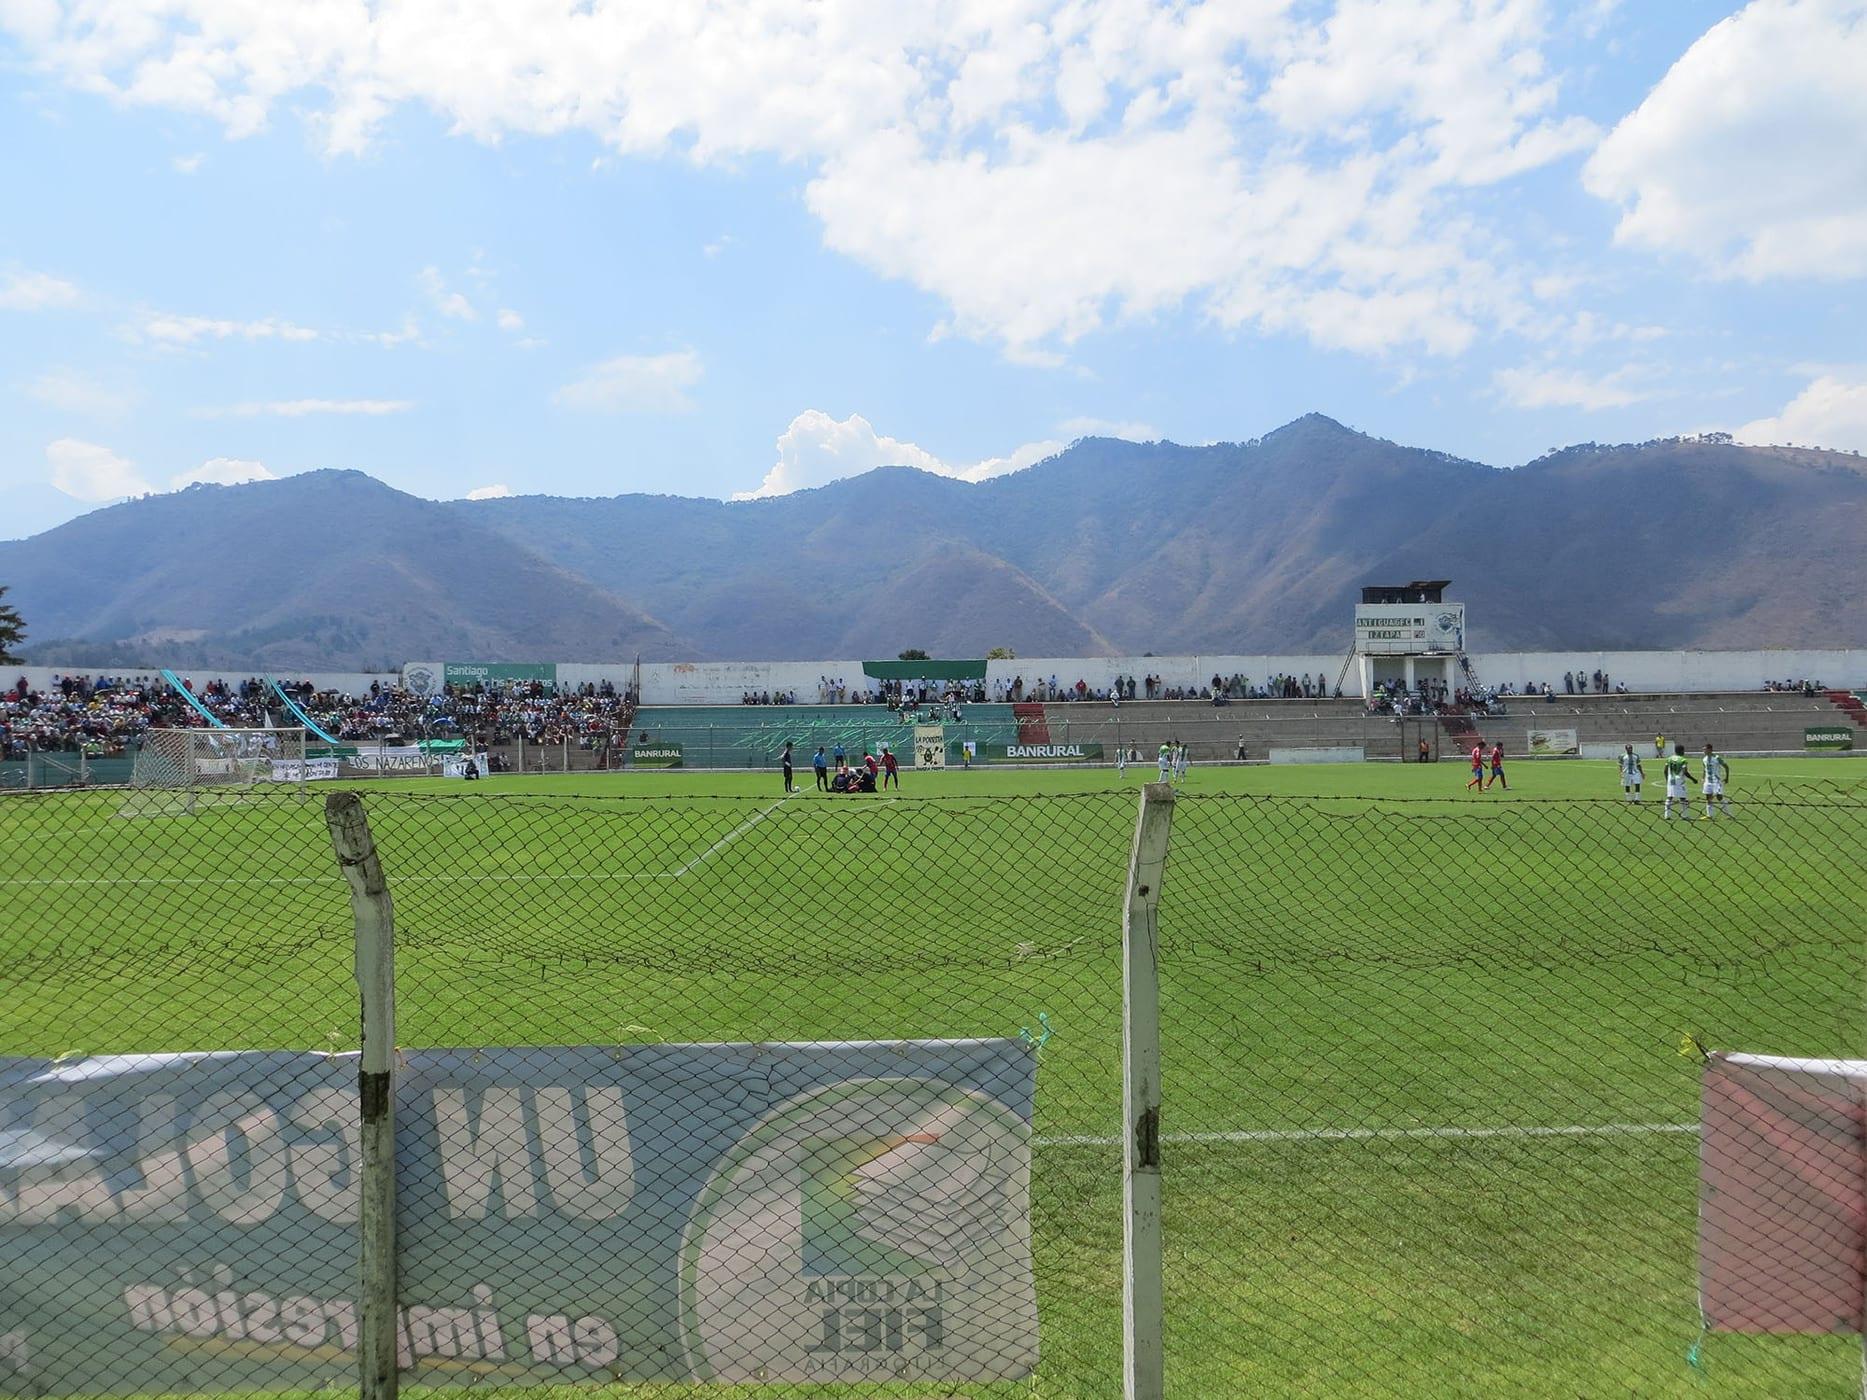 Football (soccer) game in Antigua, Guatemala